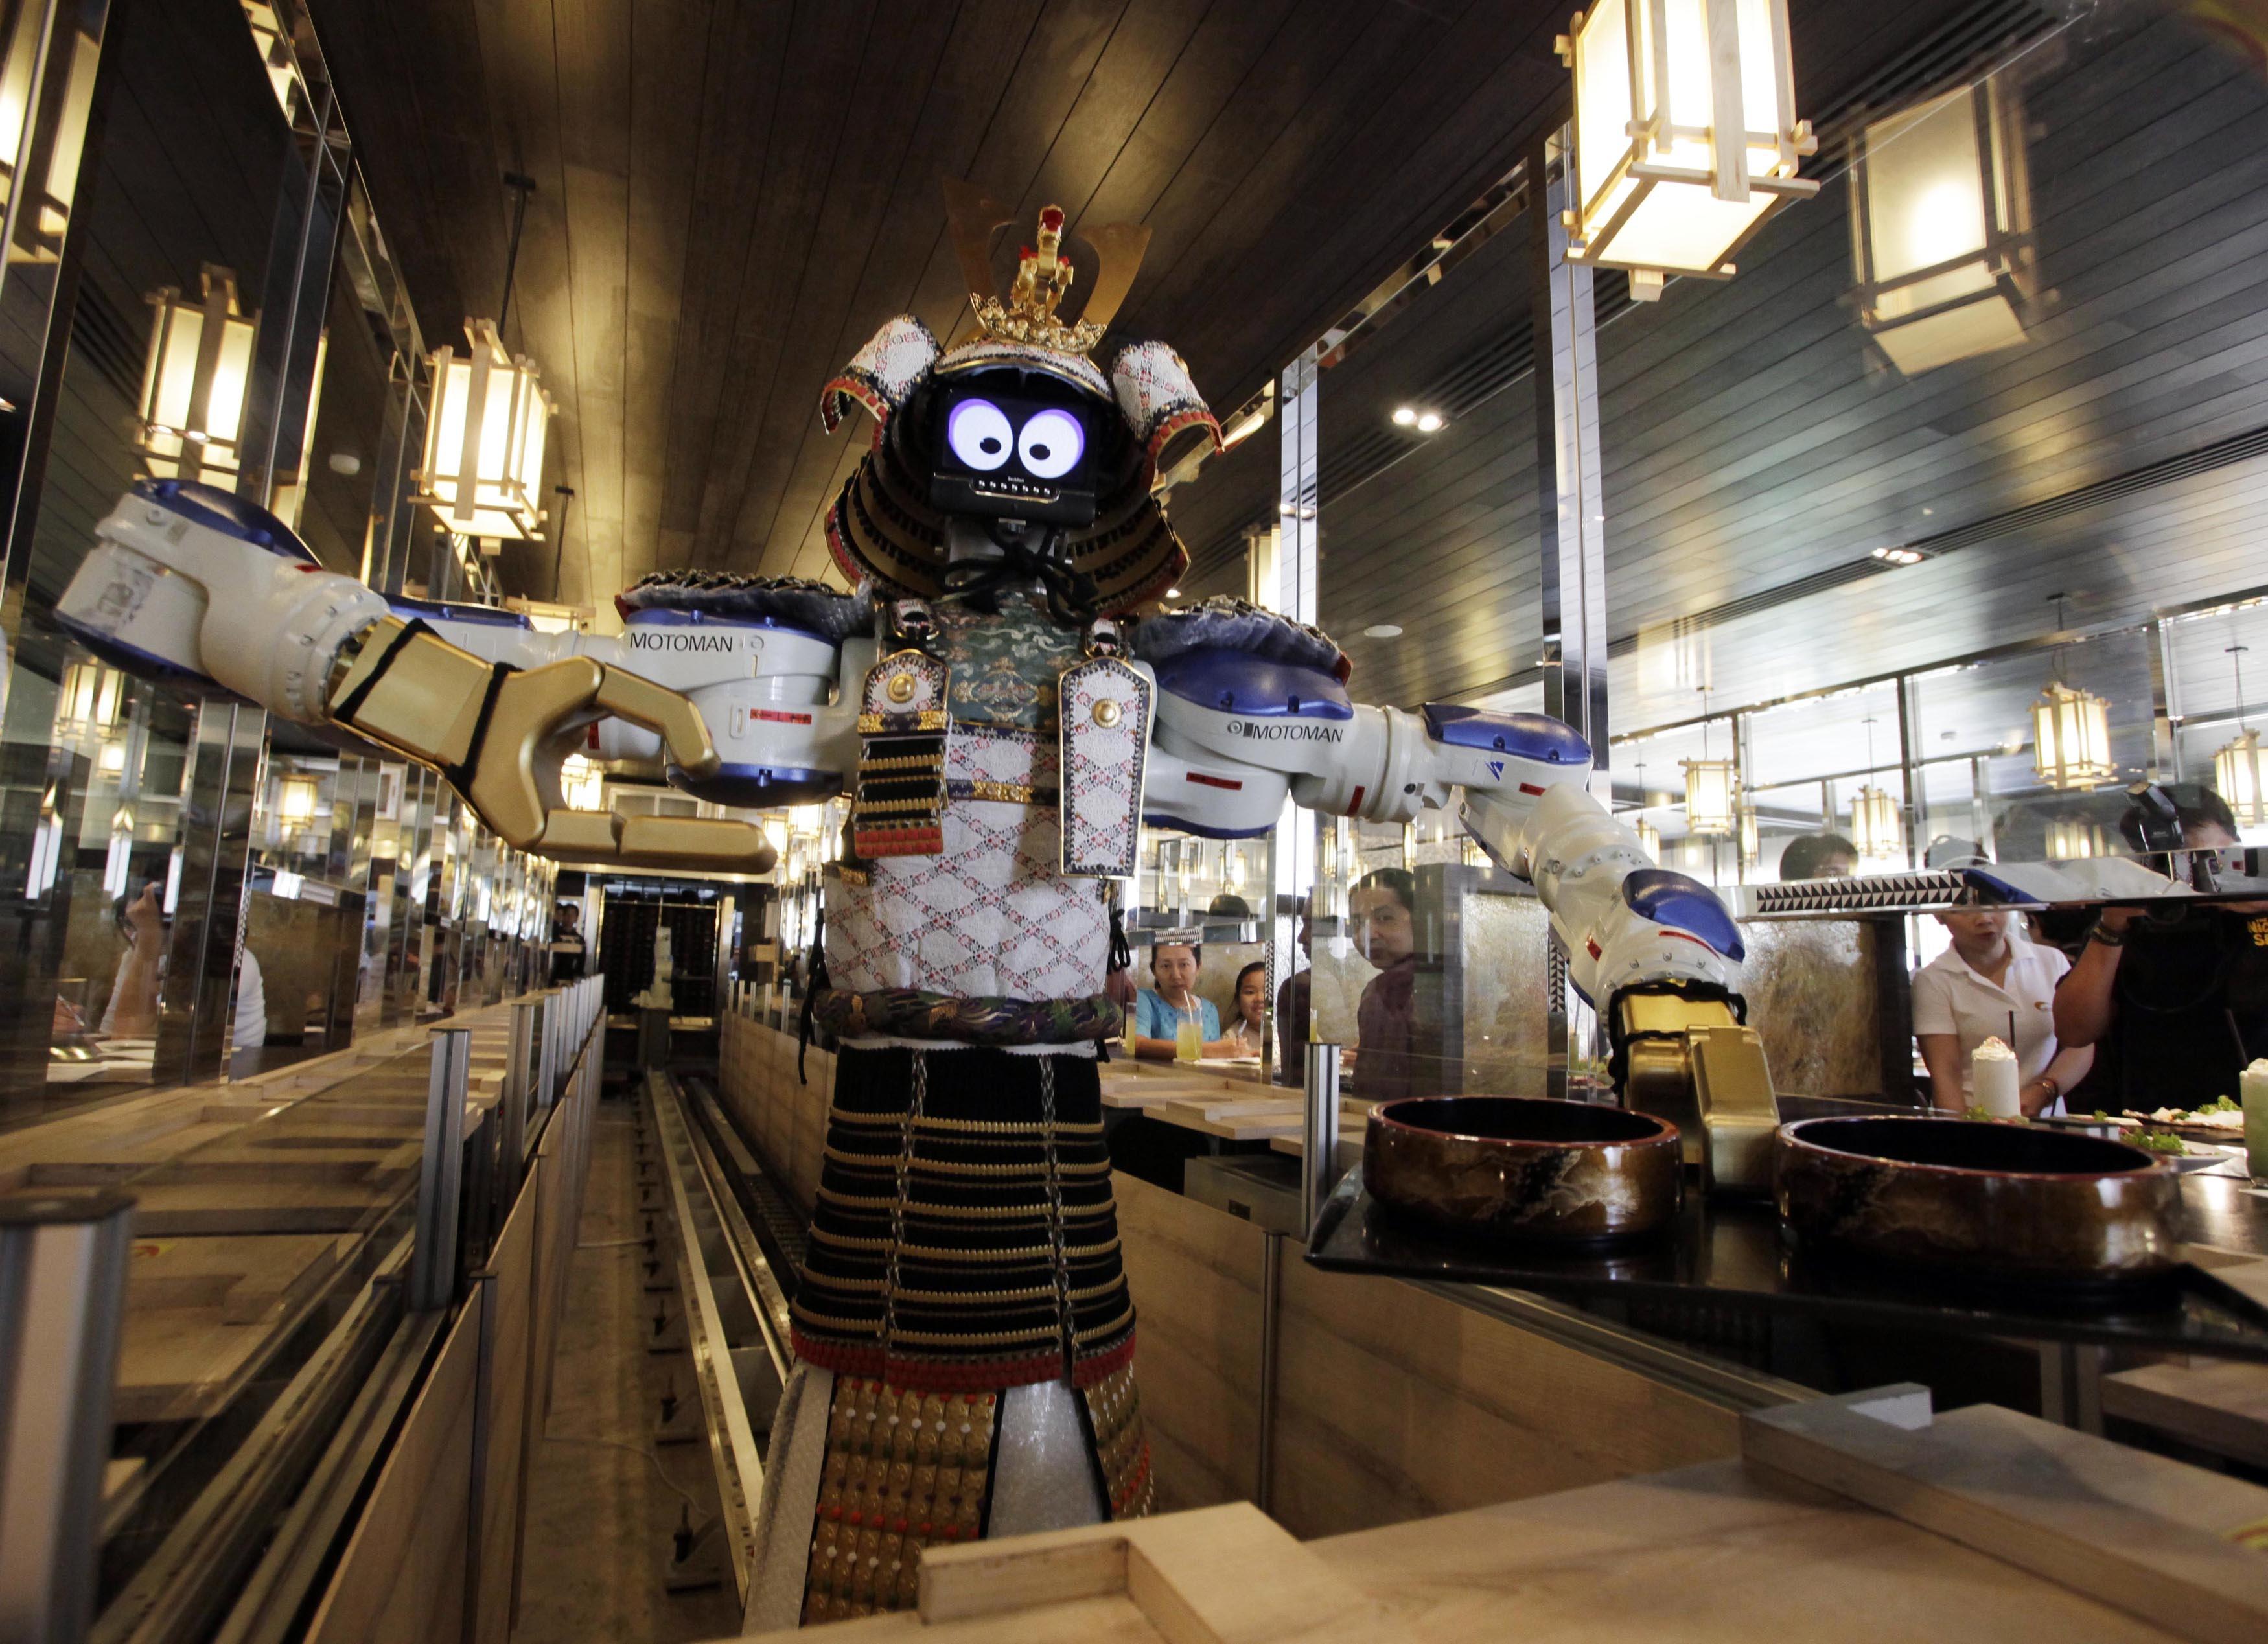 A robot waiter serves food to customers at Hajime Japanese restaurant in Bangkok